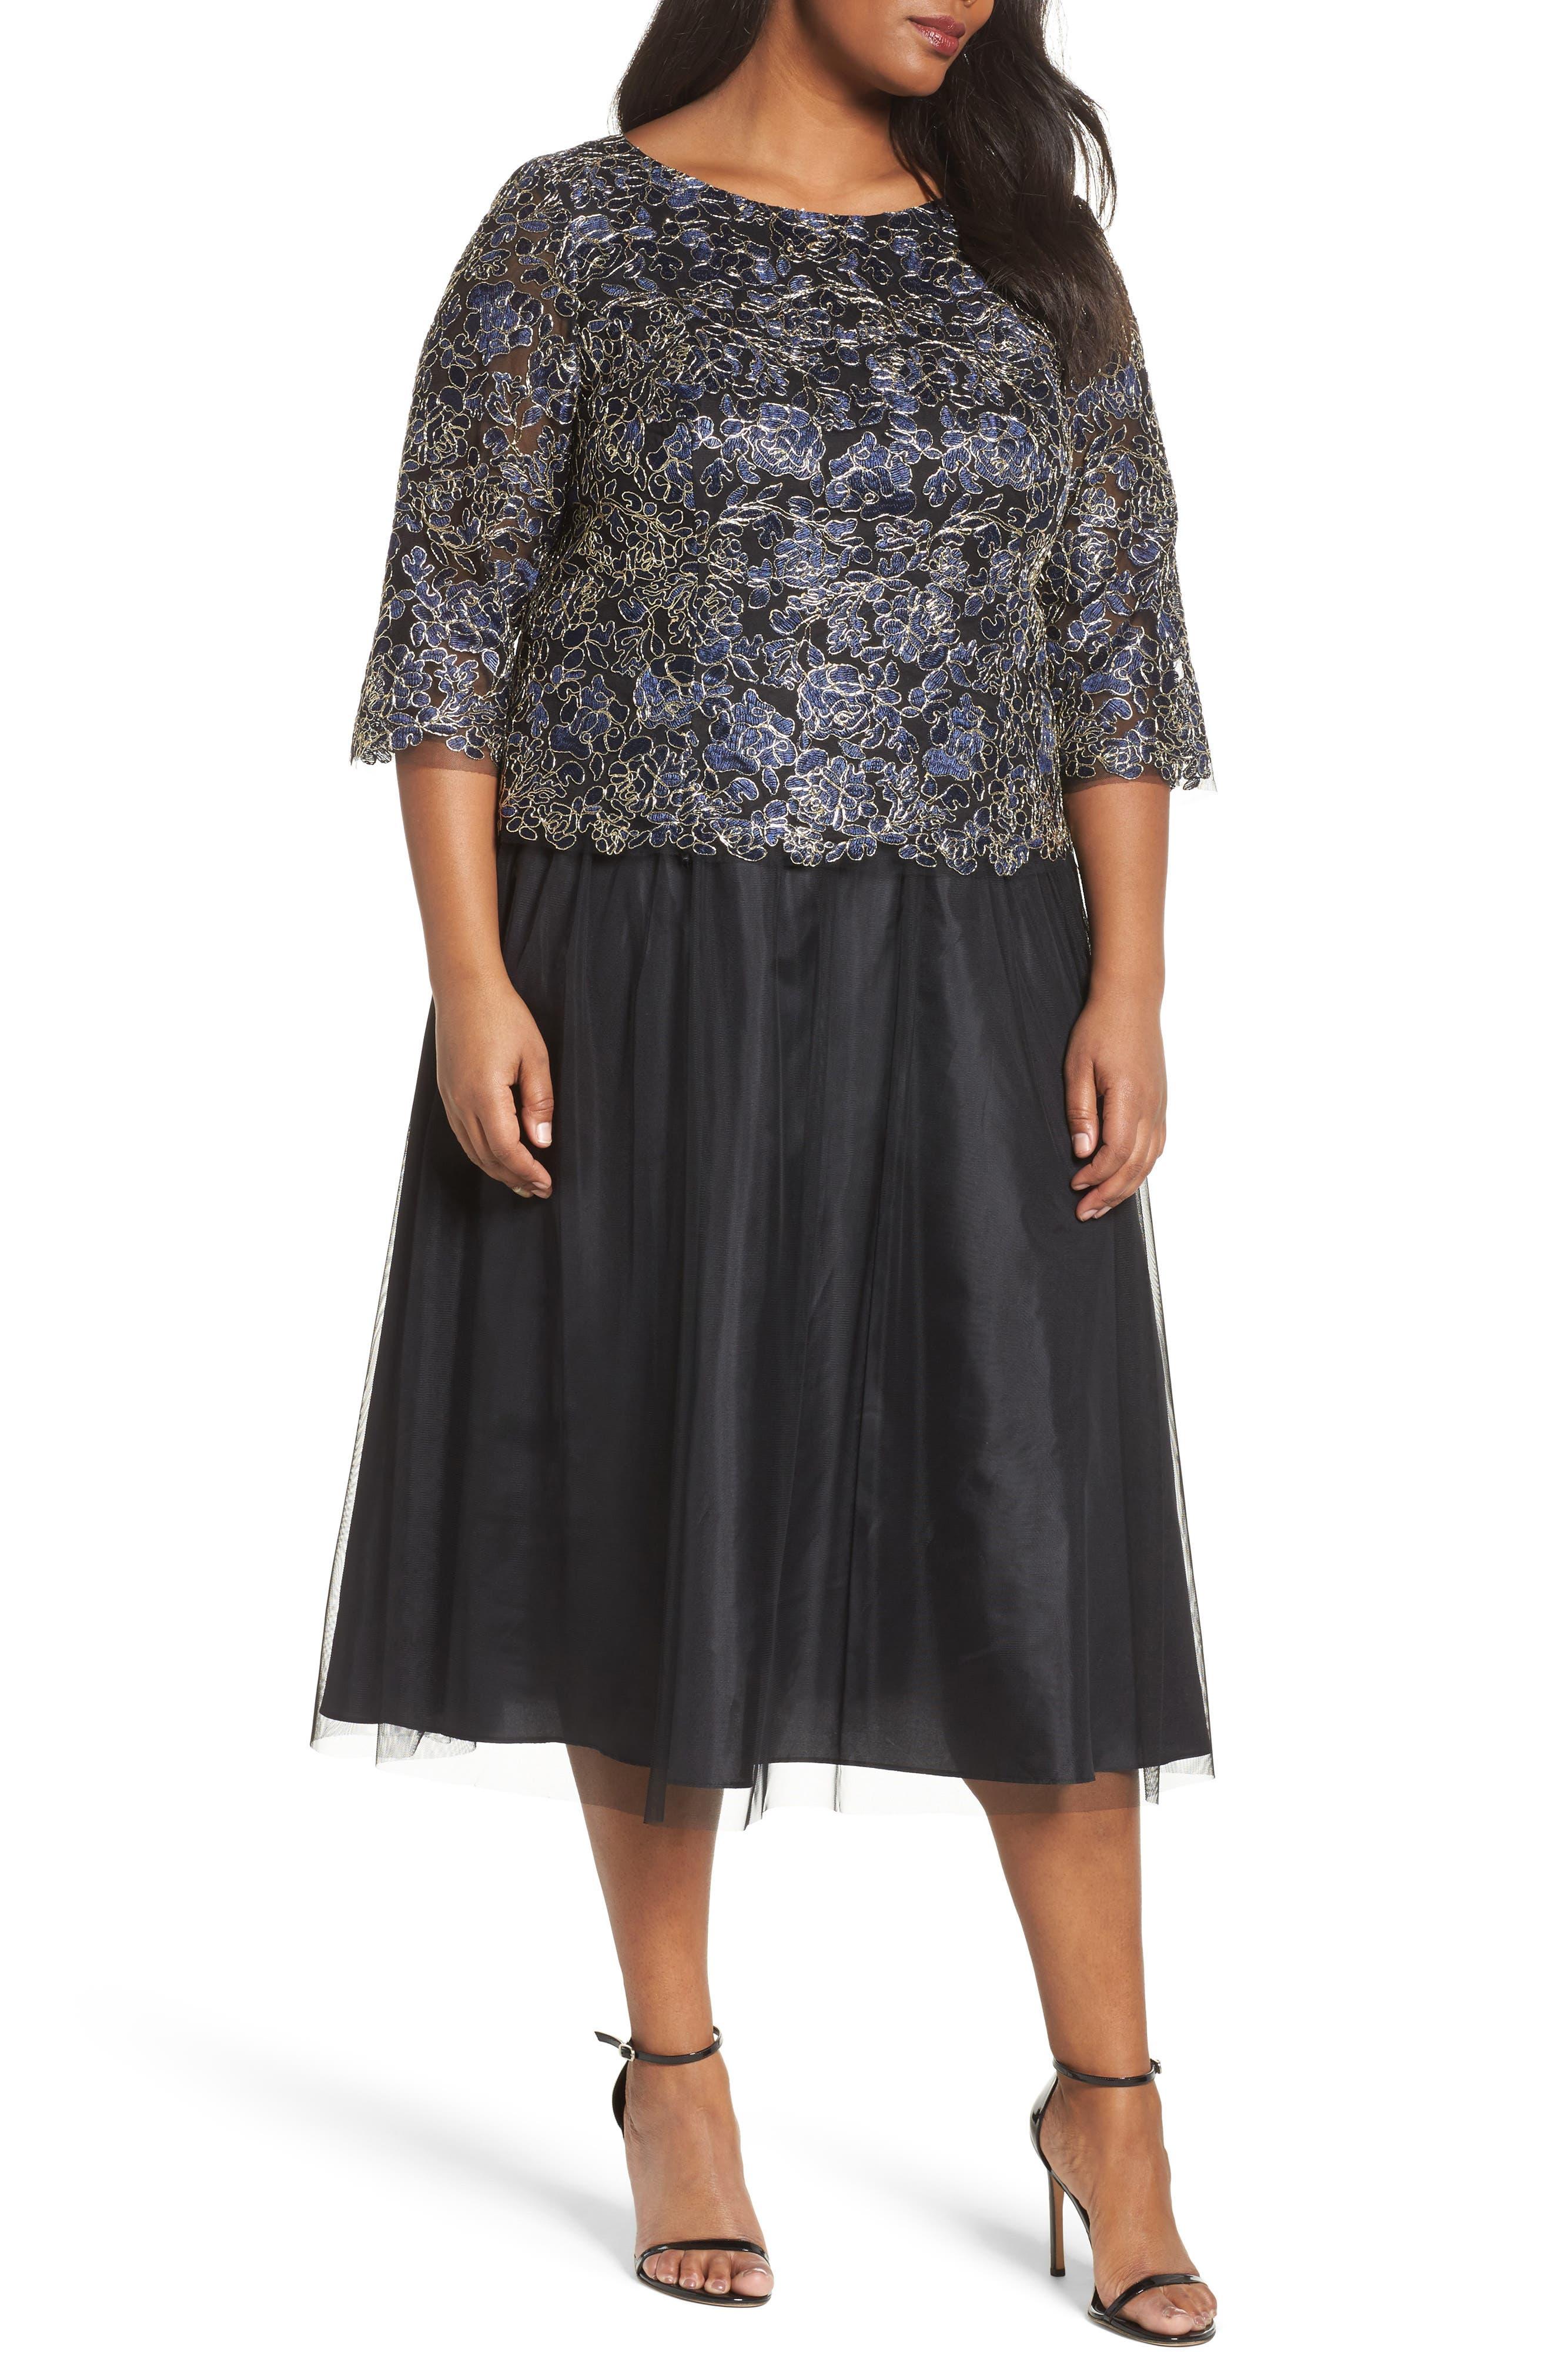 Alternate Image 1 Selected - Alex Evenings Tea Length Lace & Tulle Dress (Plus Size)